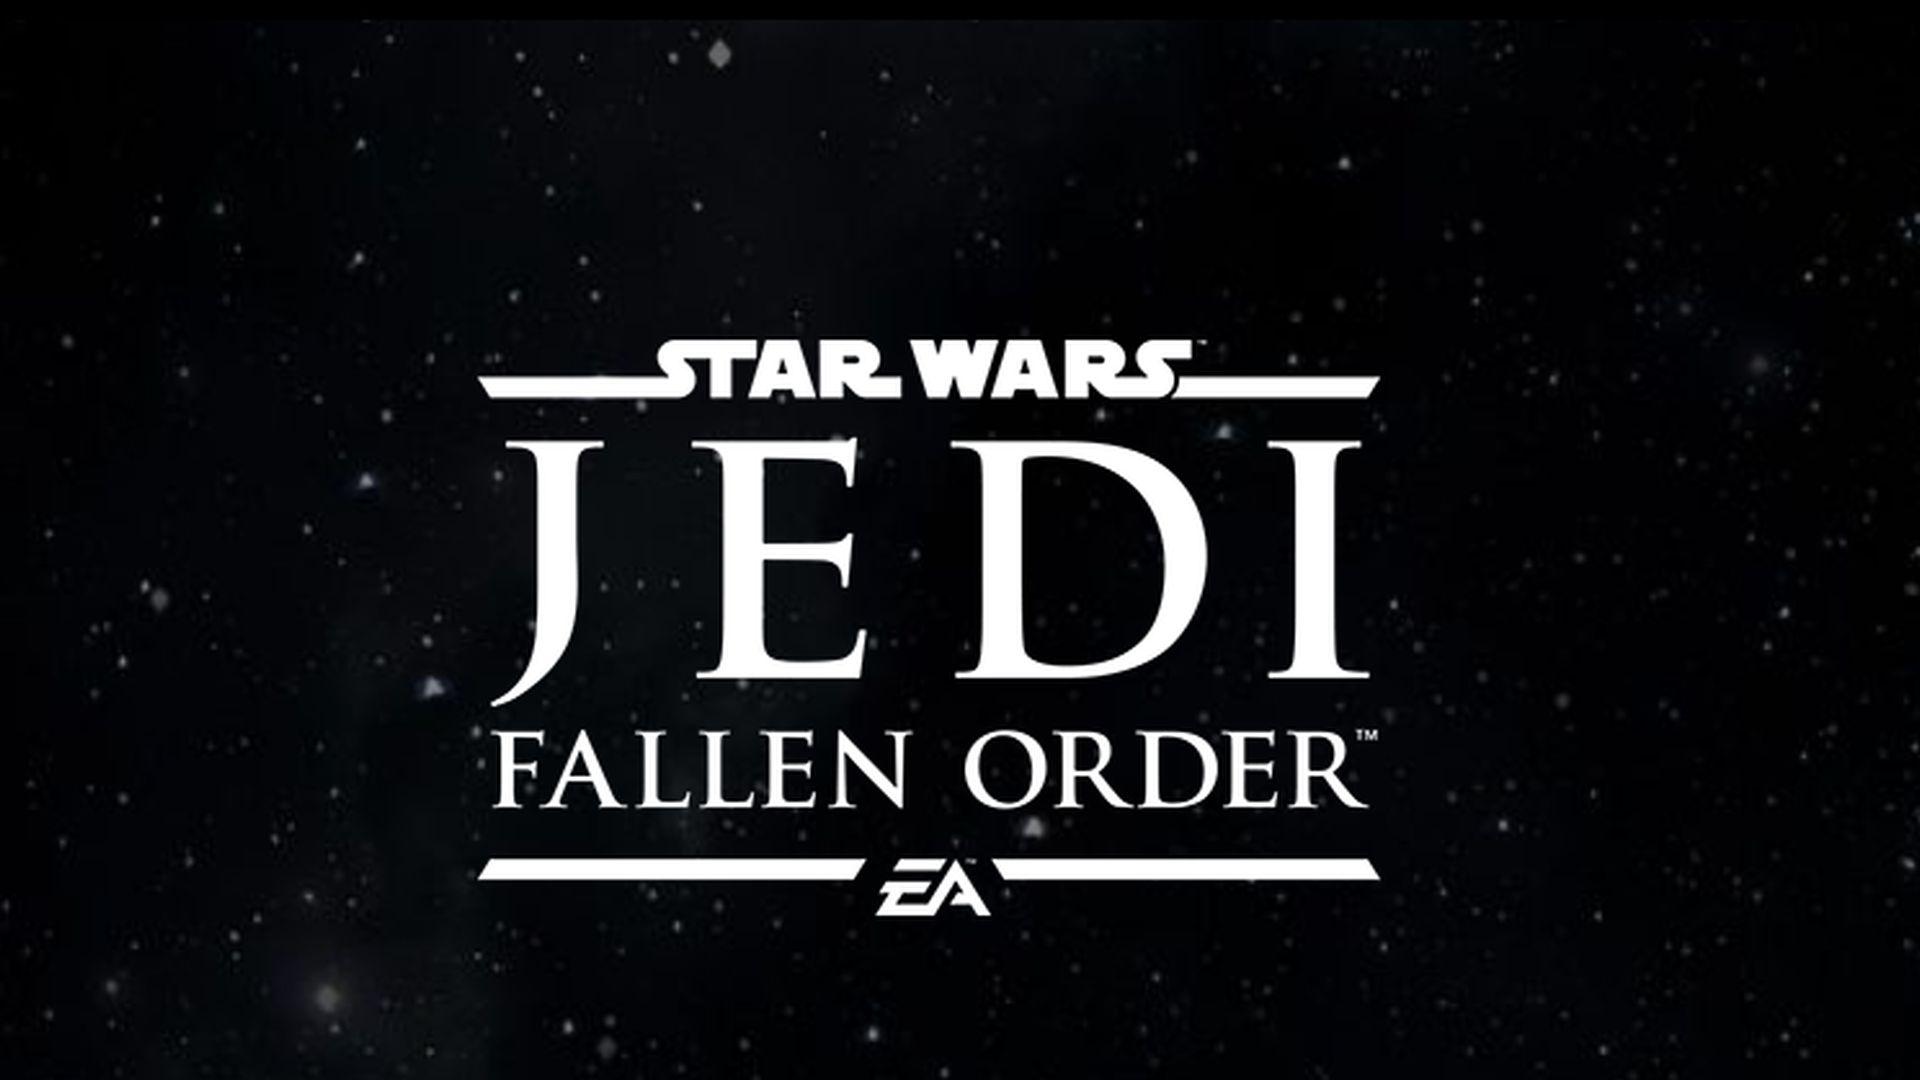 Star Wars Jedi Fallen Order, Respawn, EA, GamersRD